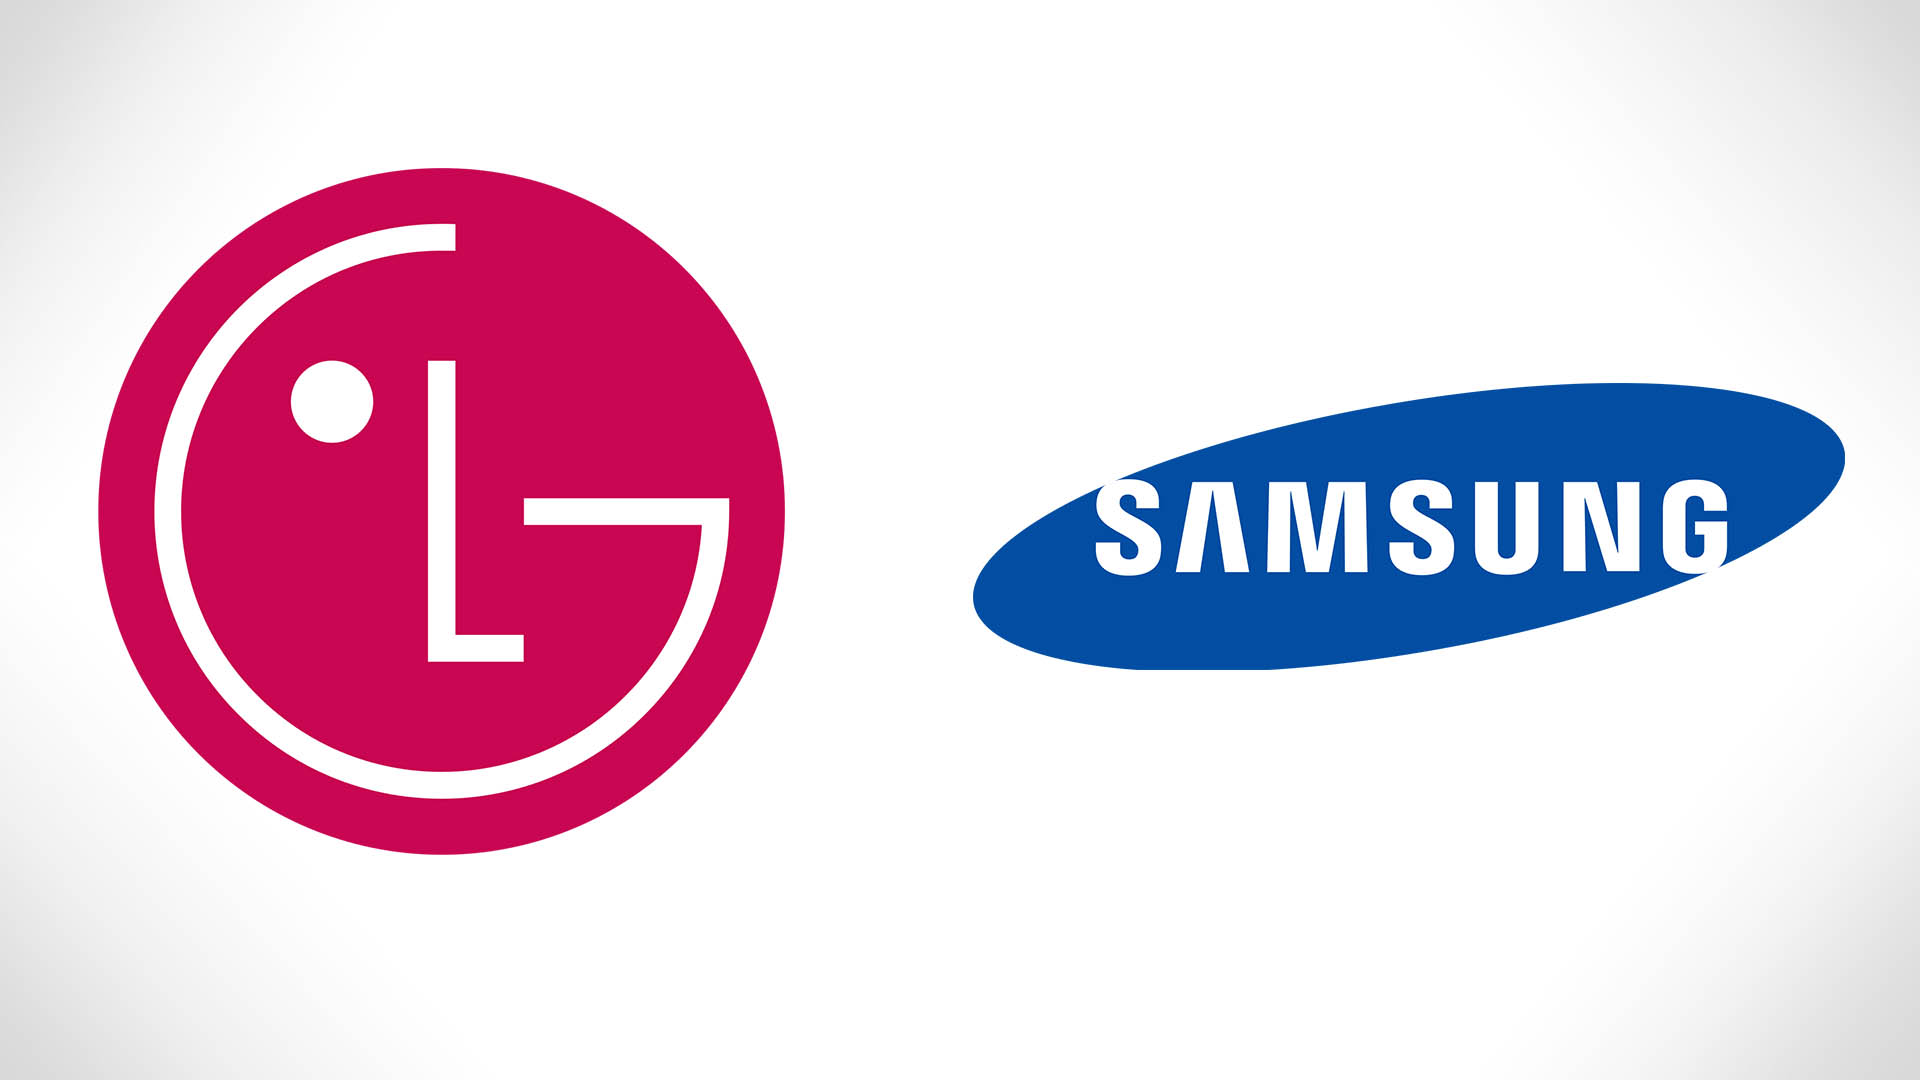 Логотипы LG и Samsung